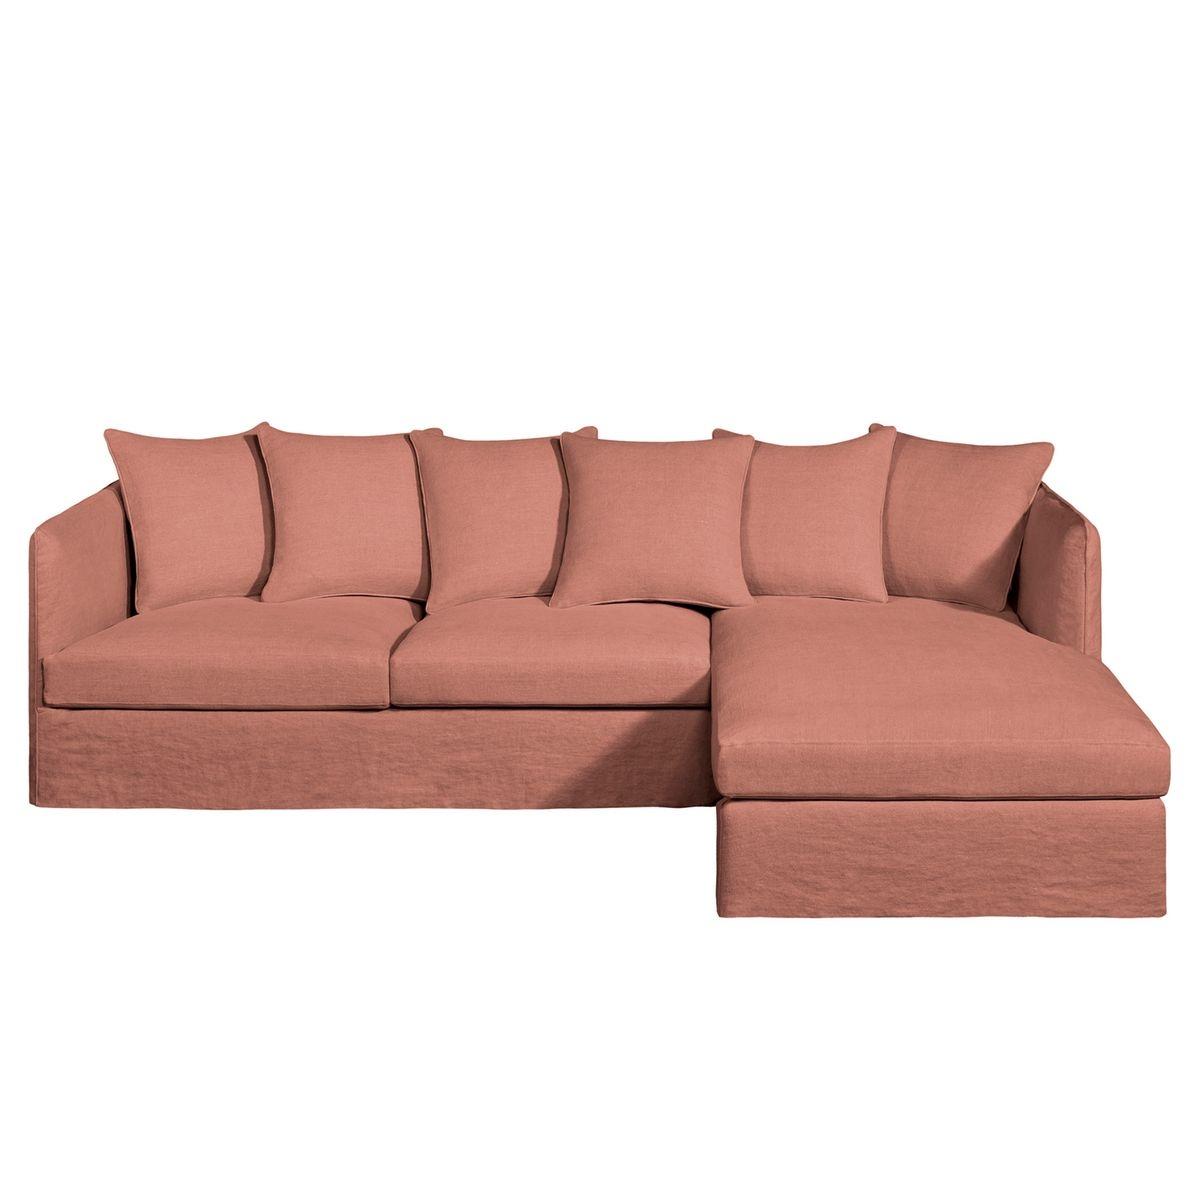 canap angle conv neo chiquito lin pais. Black Bedroom Furniture Sets. Home Design Ideas